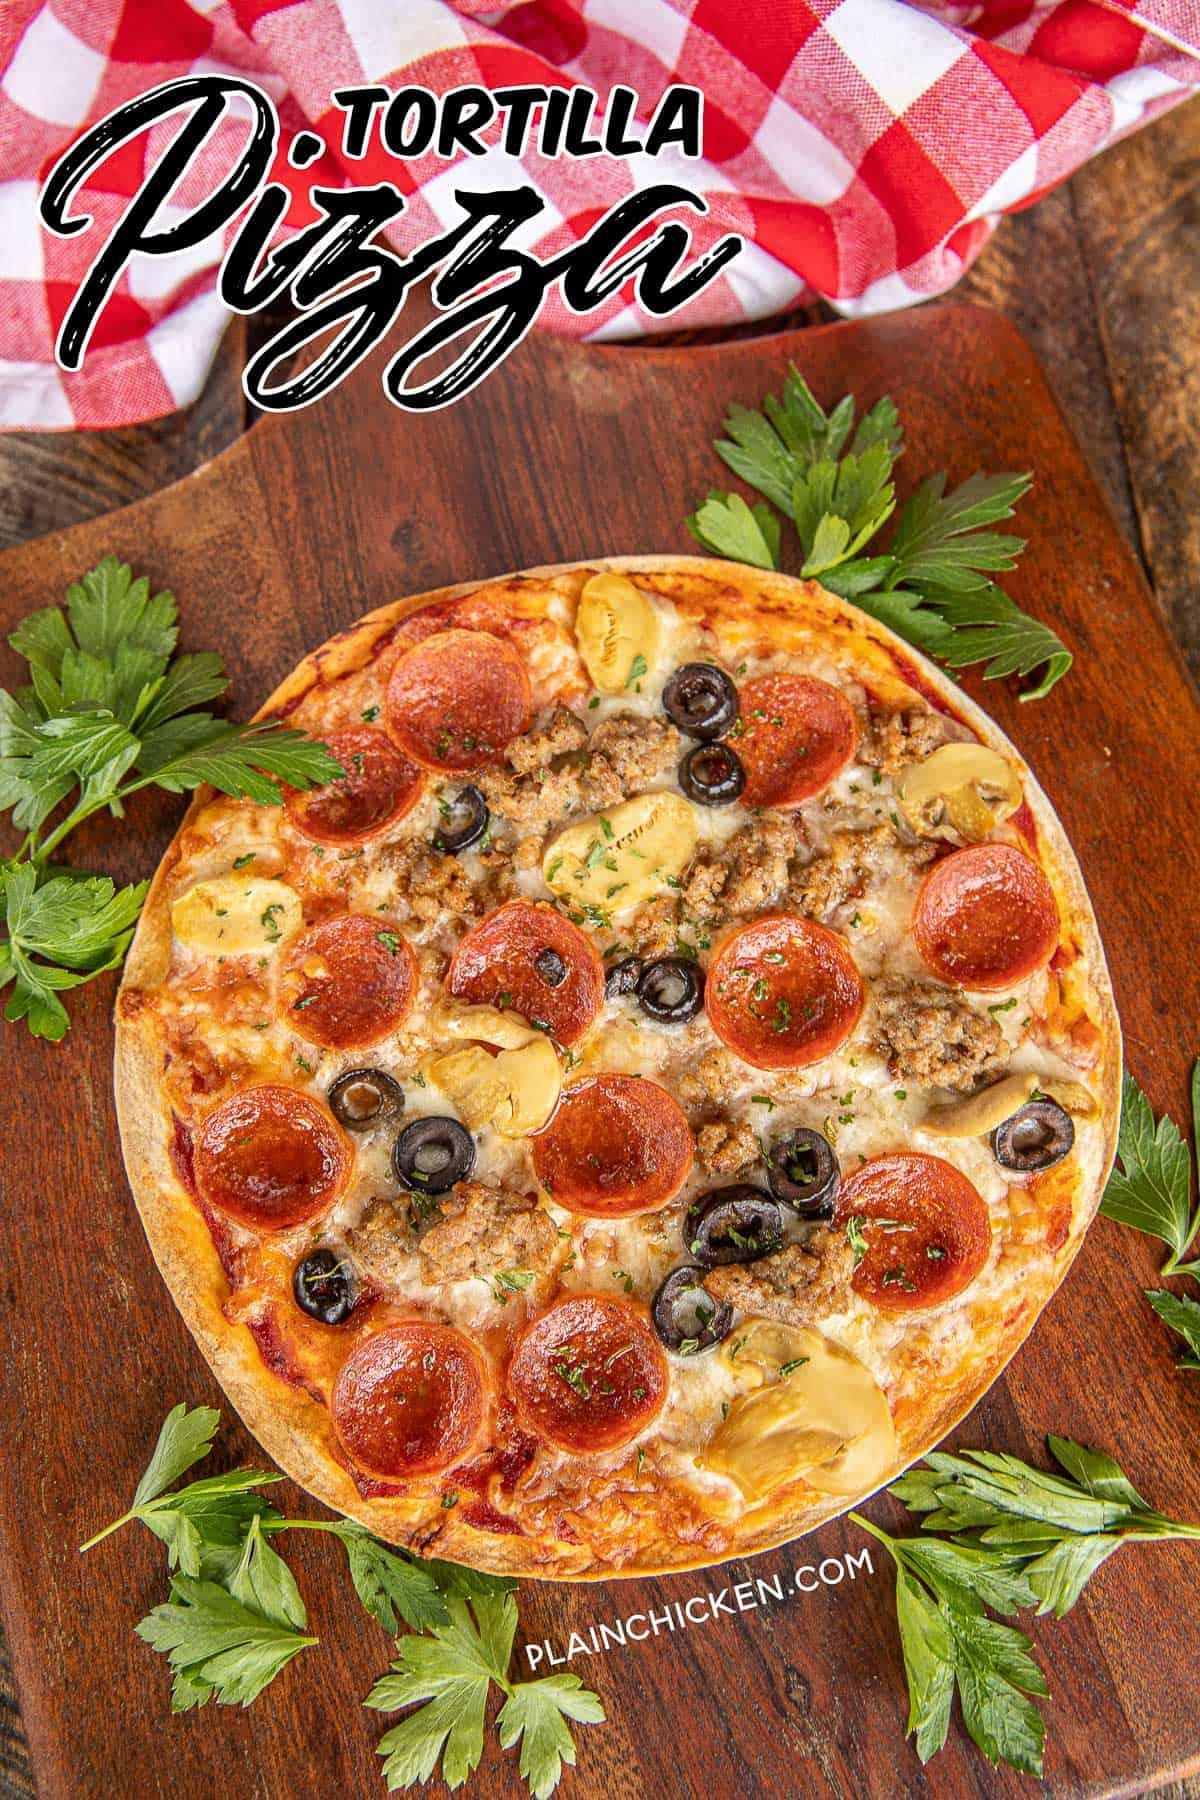 Tortilla Pizza Cracker Pizza Plain Chicken